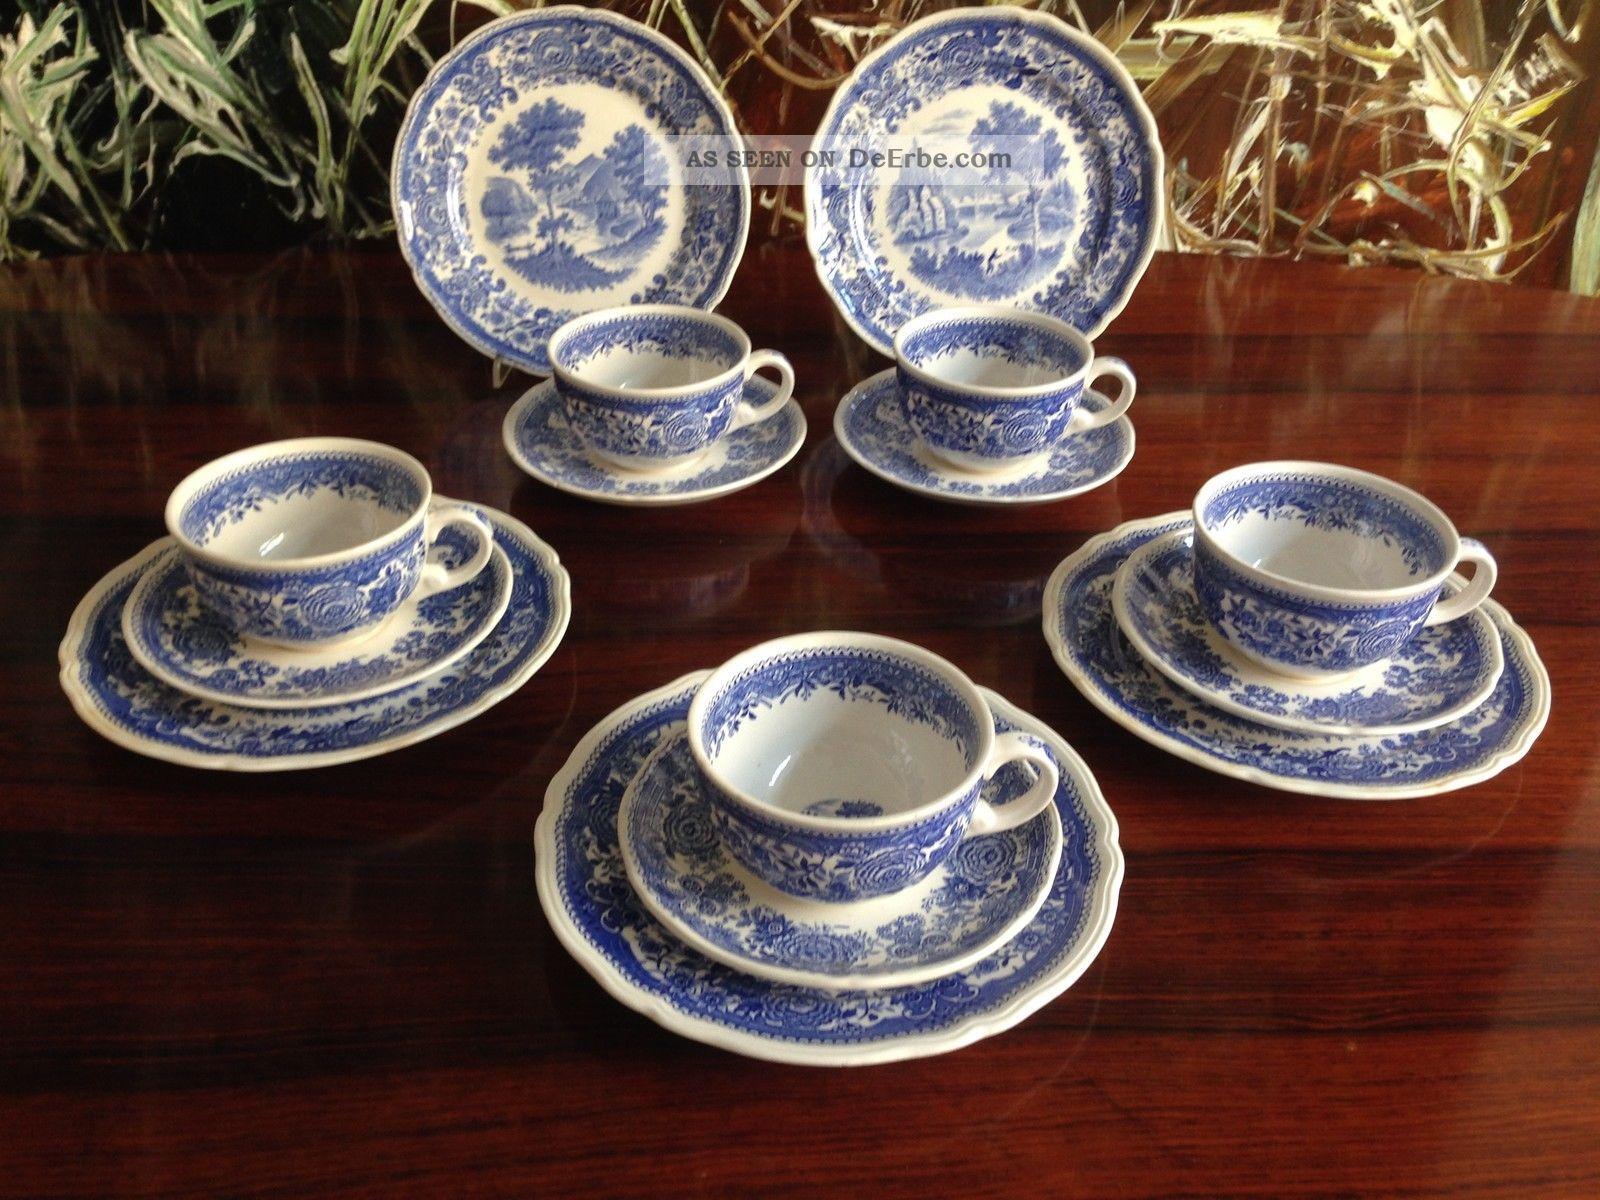 villeroy boch burgenland in blau 5 kaffee oder teegedecke. Black Bedroom Furniture Sets. Home Design Ideas